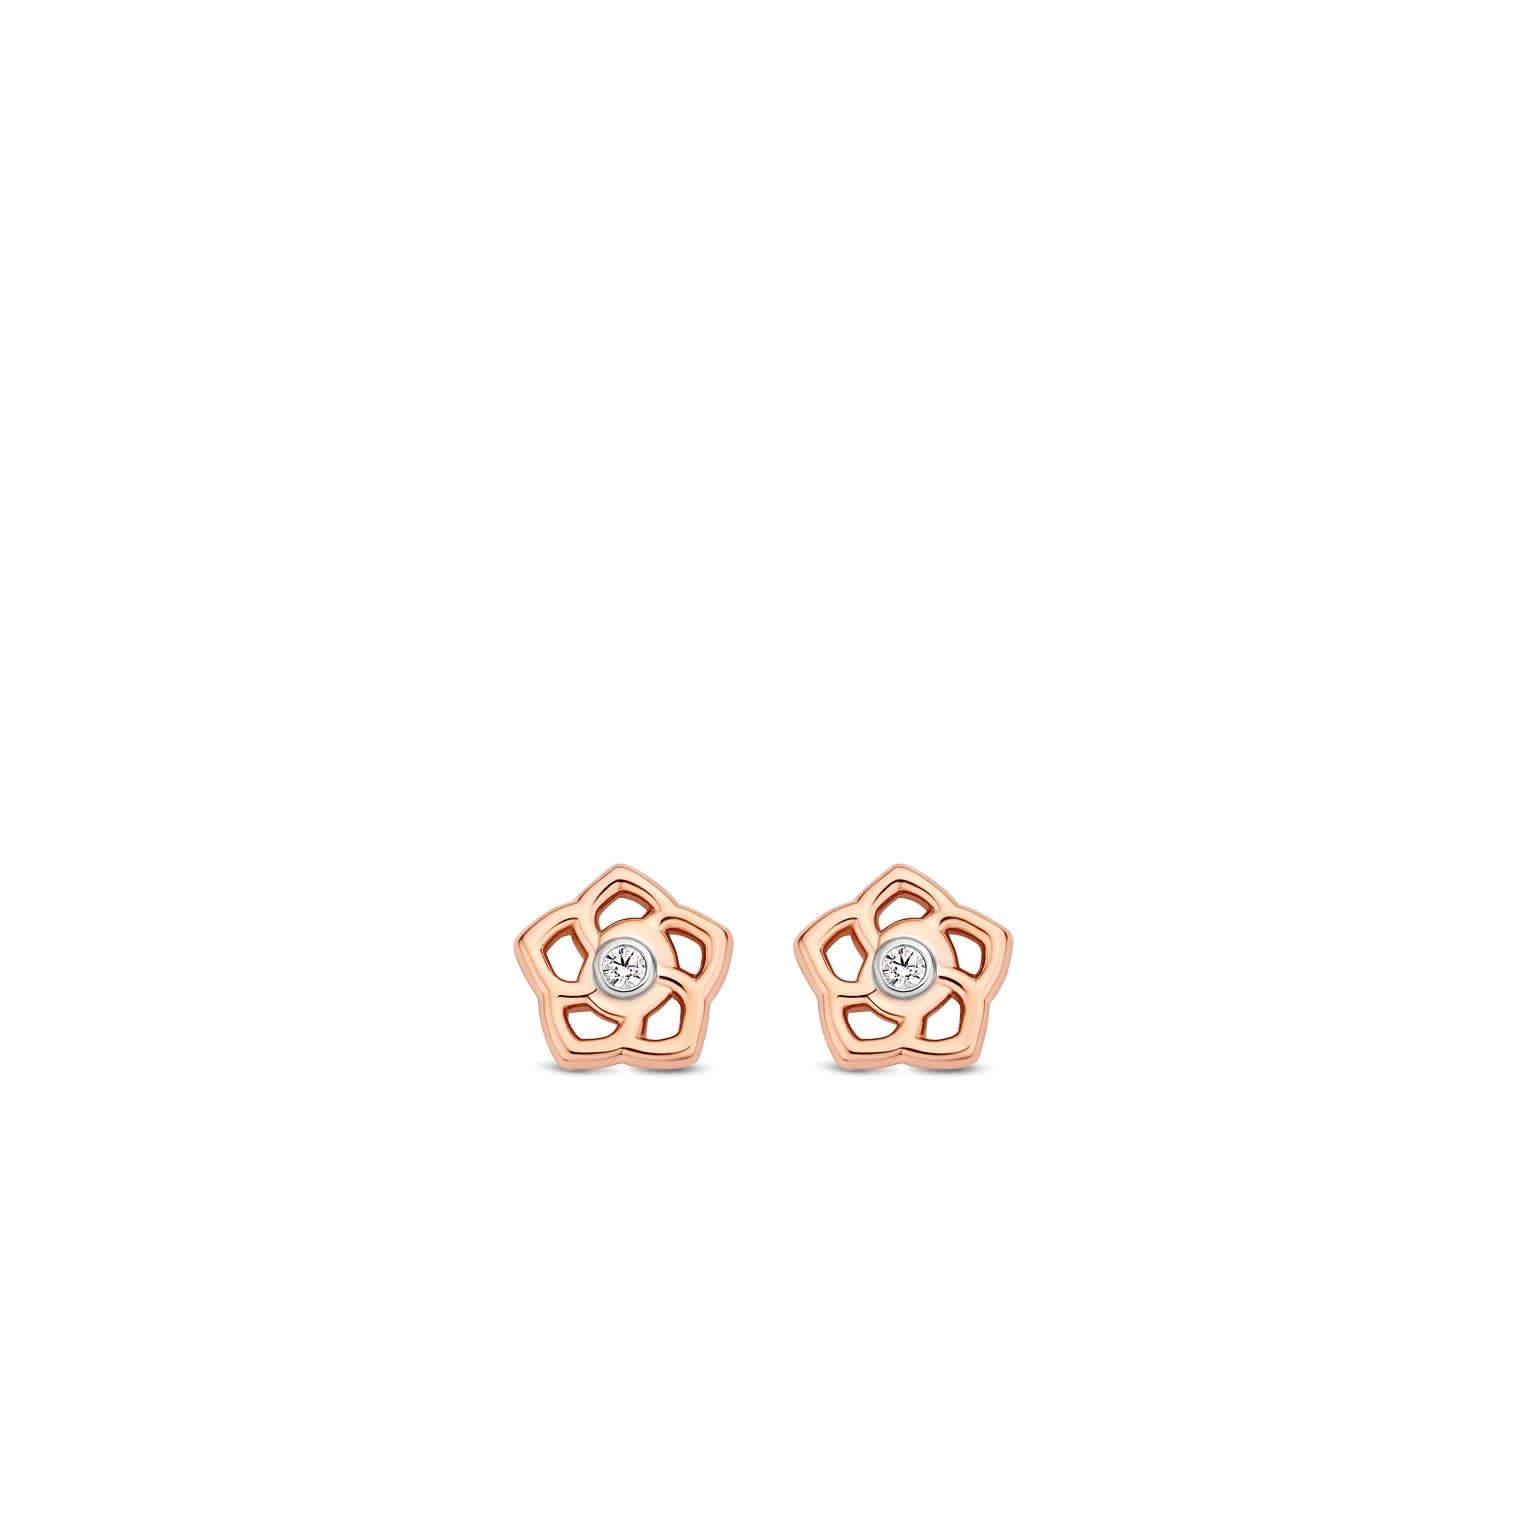 TI SENTO - Milano Earrings 7809ZR-1